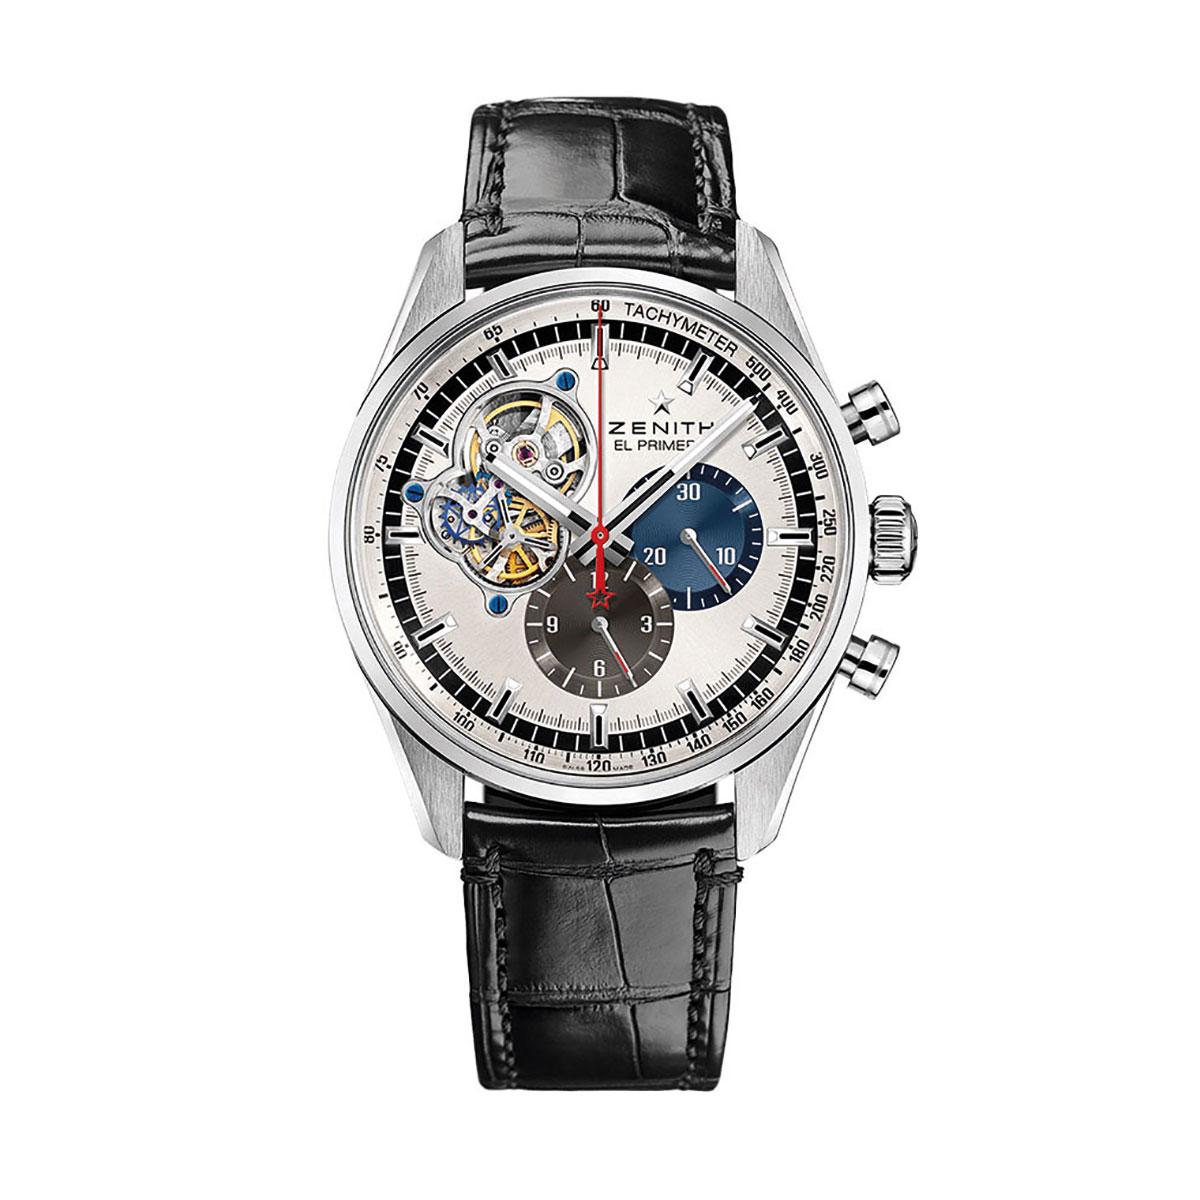 Zenith Chronomaster El Primero Open 42mm Watch